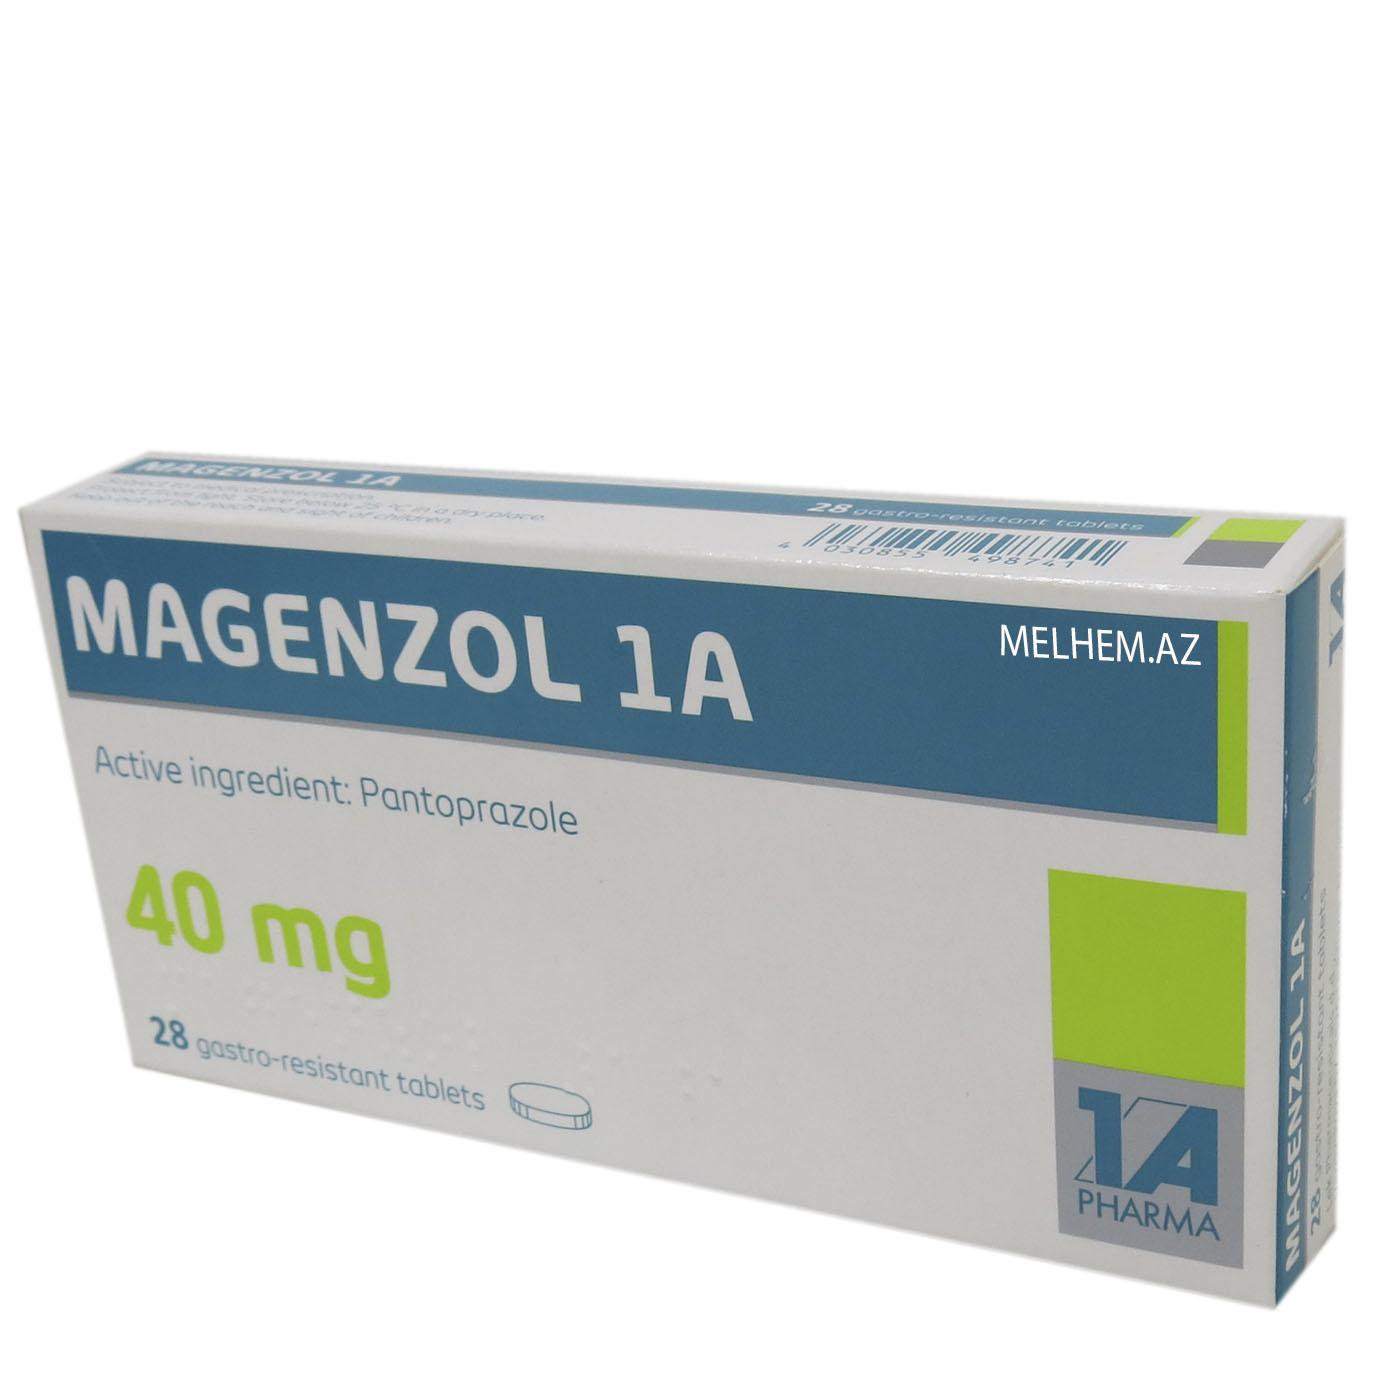 MAGENZOL 1A 40MG N28